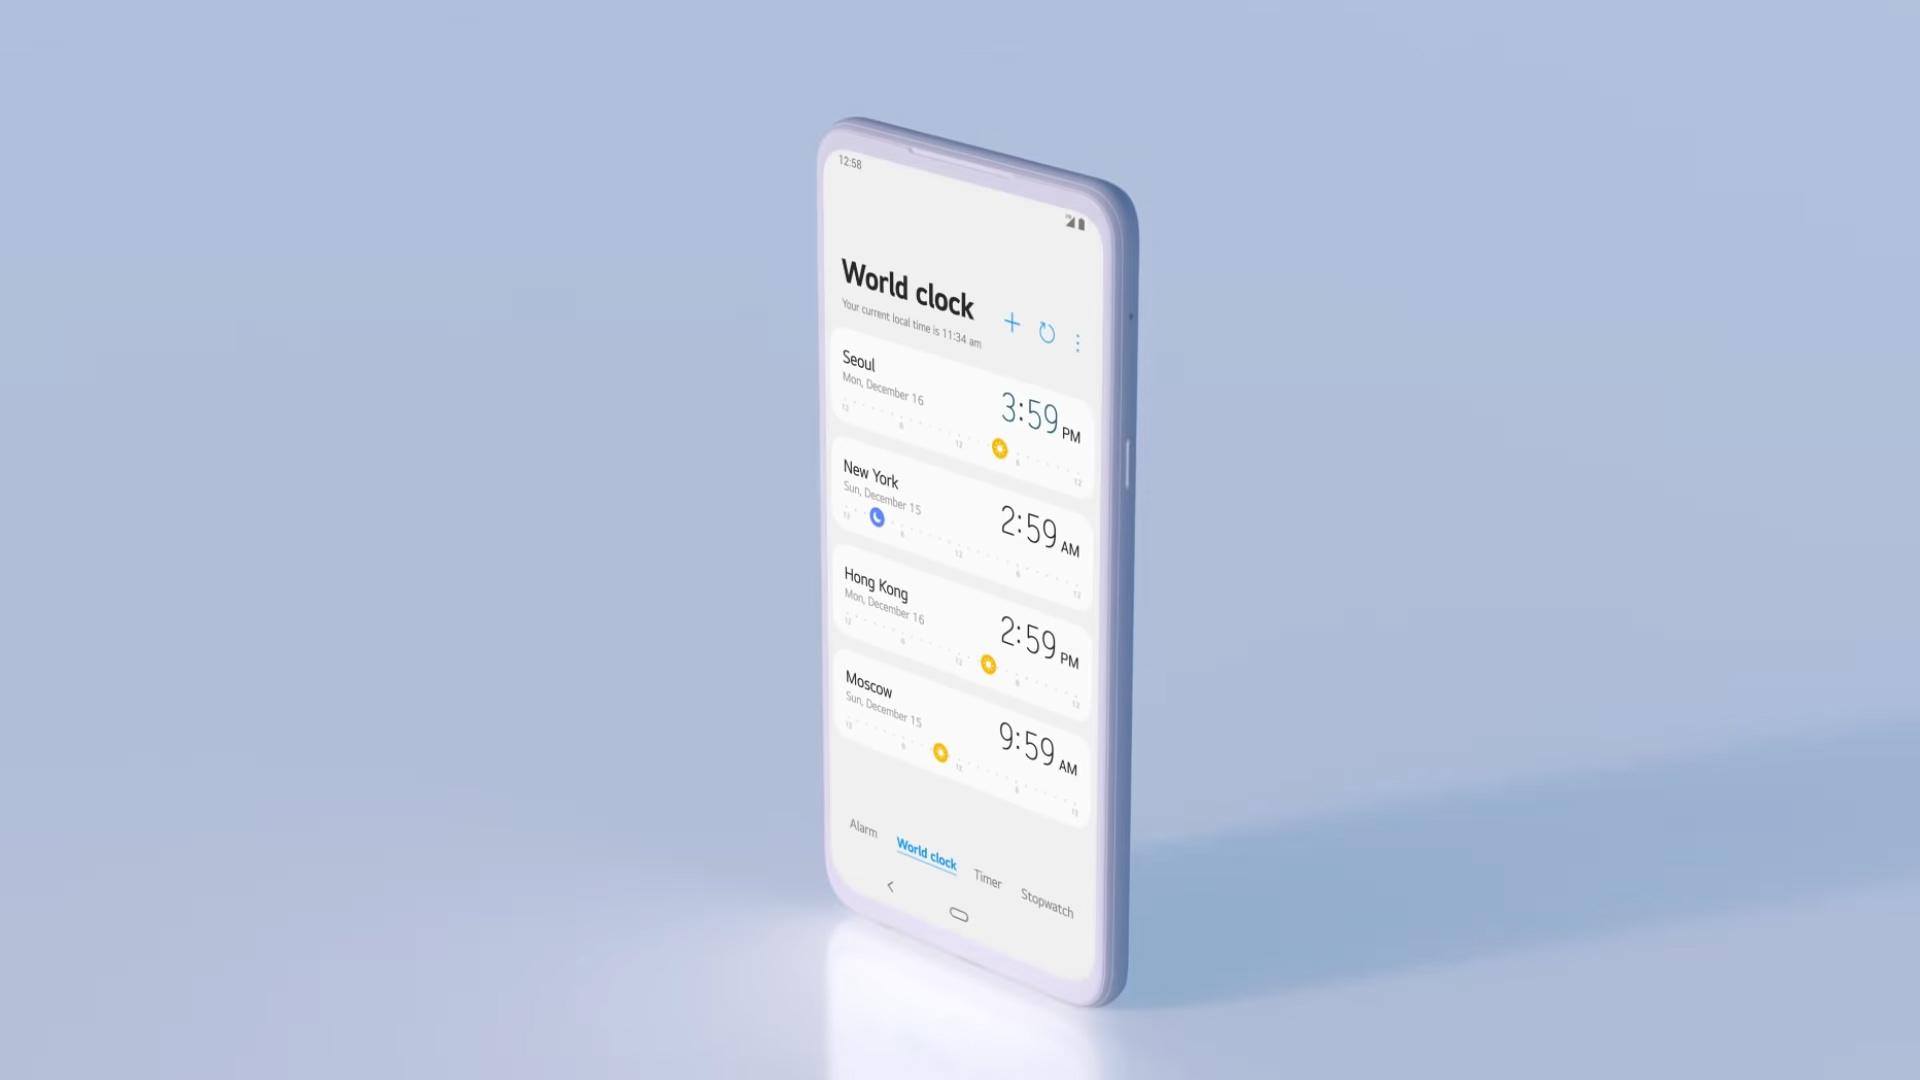 LG UX 9 screenshot of the Clock app